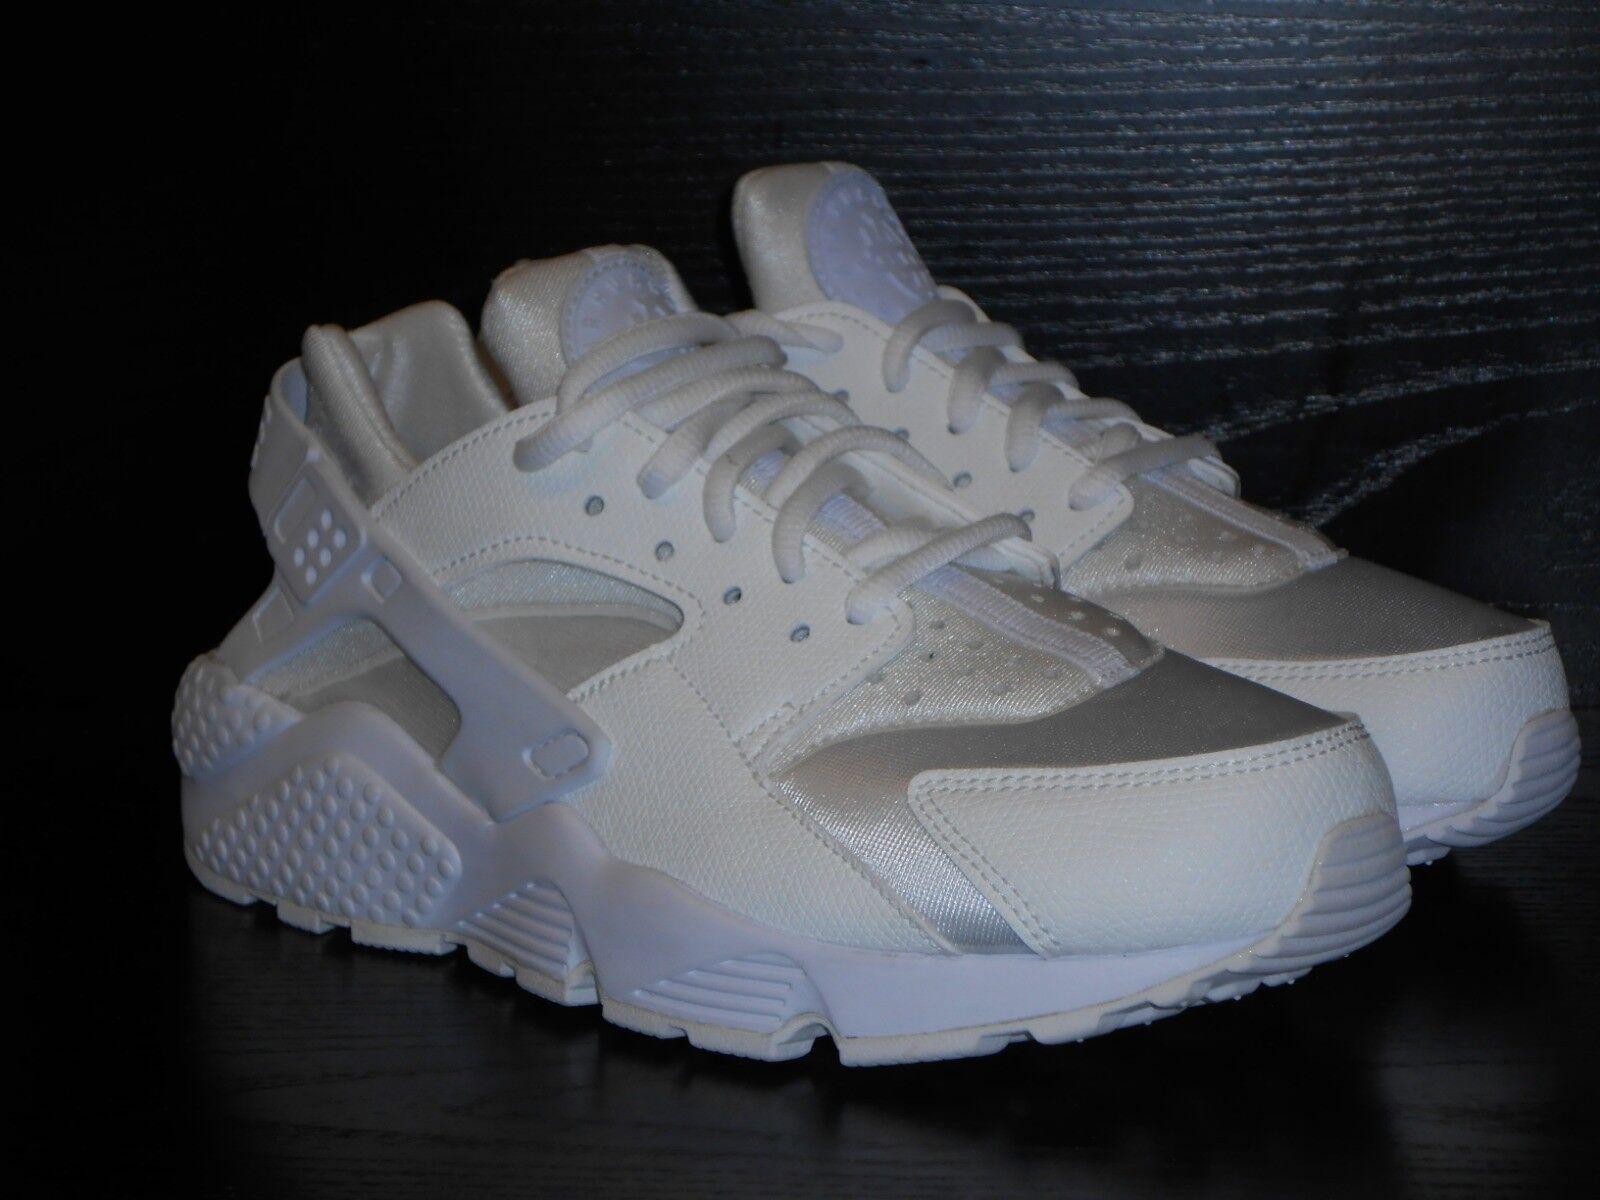 Nike Huarache Trainer Run Damenschuhe Trainer Huarache Schuhe Größe 4 Weiß  /- 11a6d7